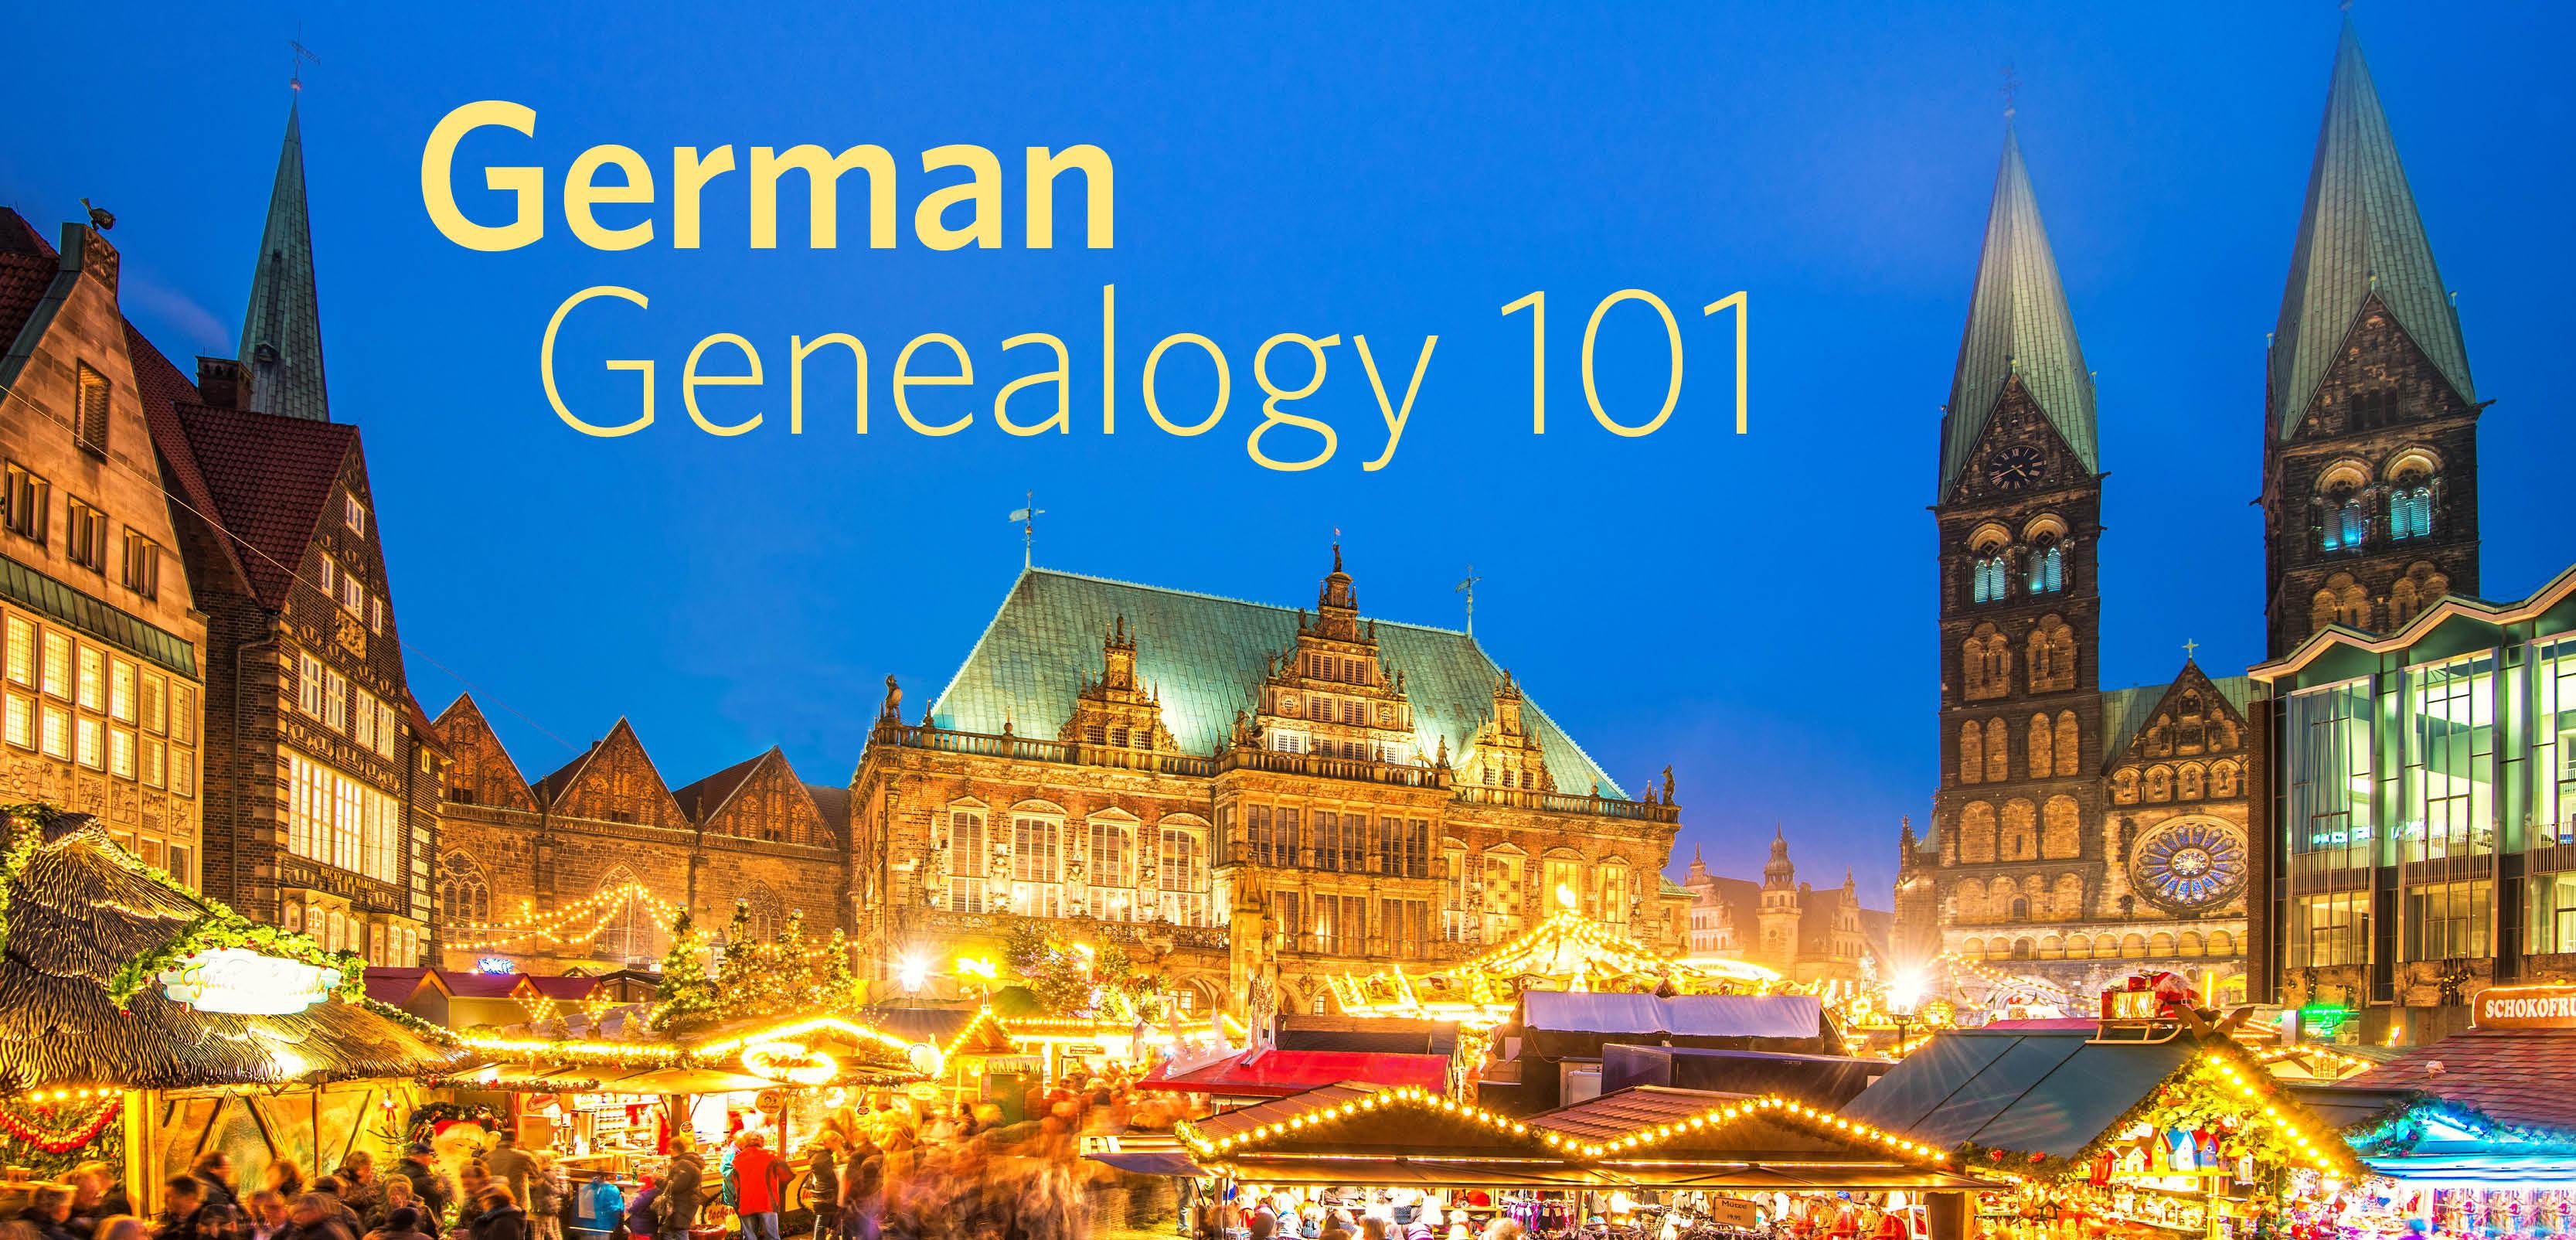 German Genealogy 101